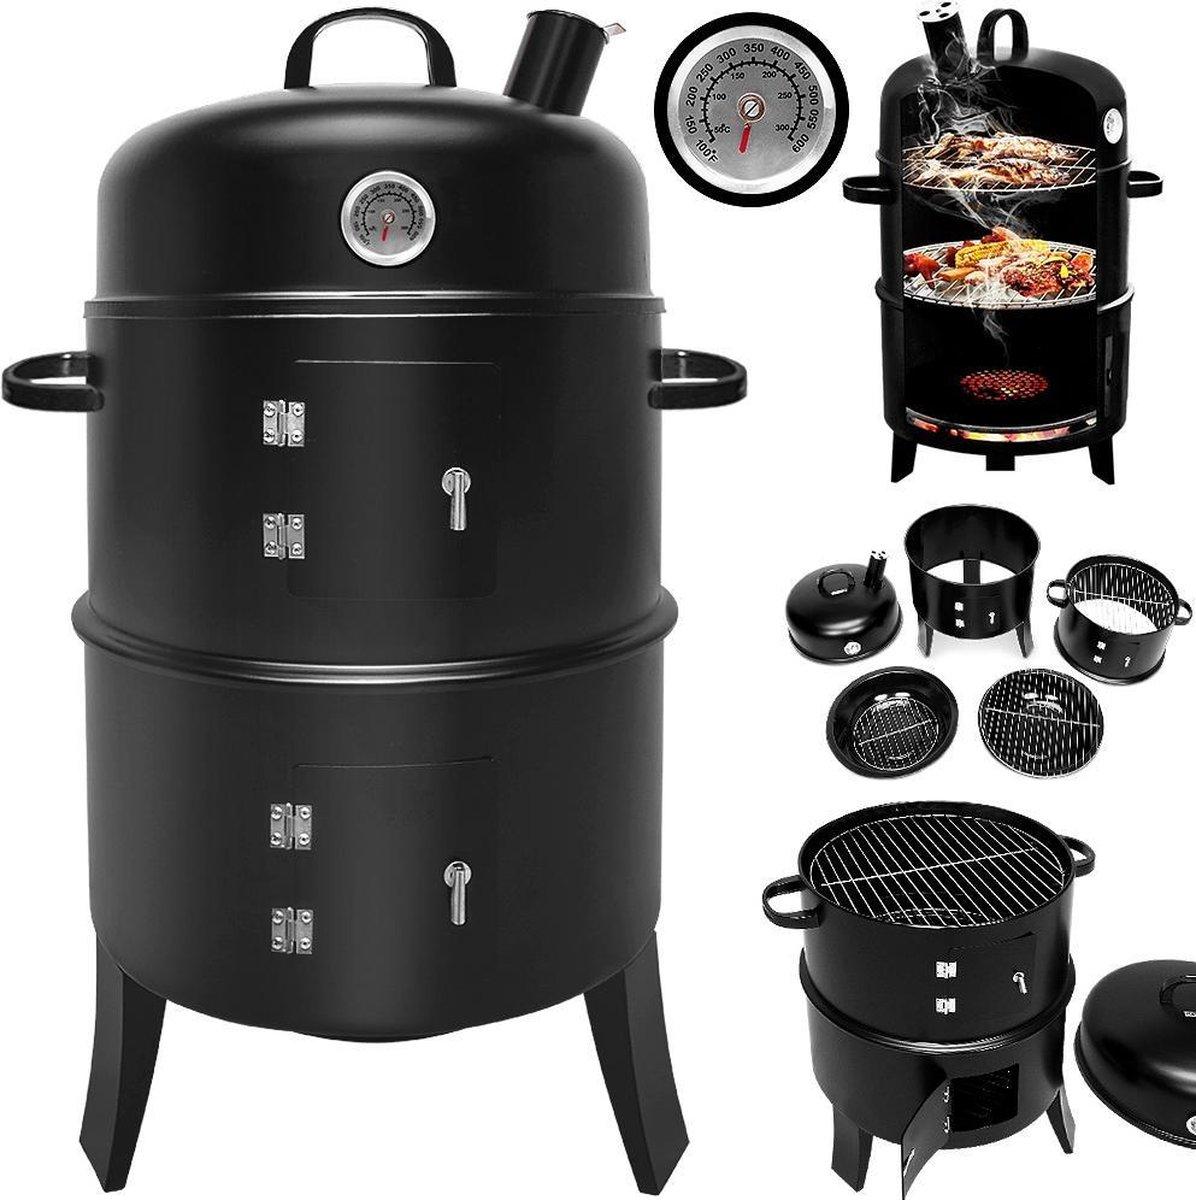 Monzana Barbecue-ROKER-Grill-Oven